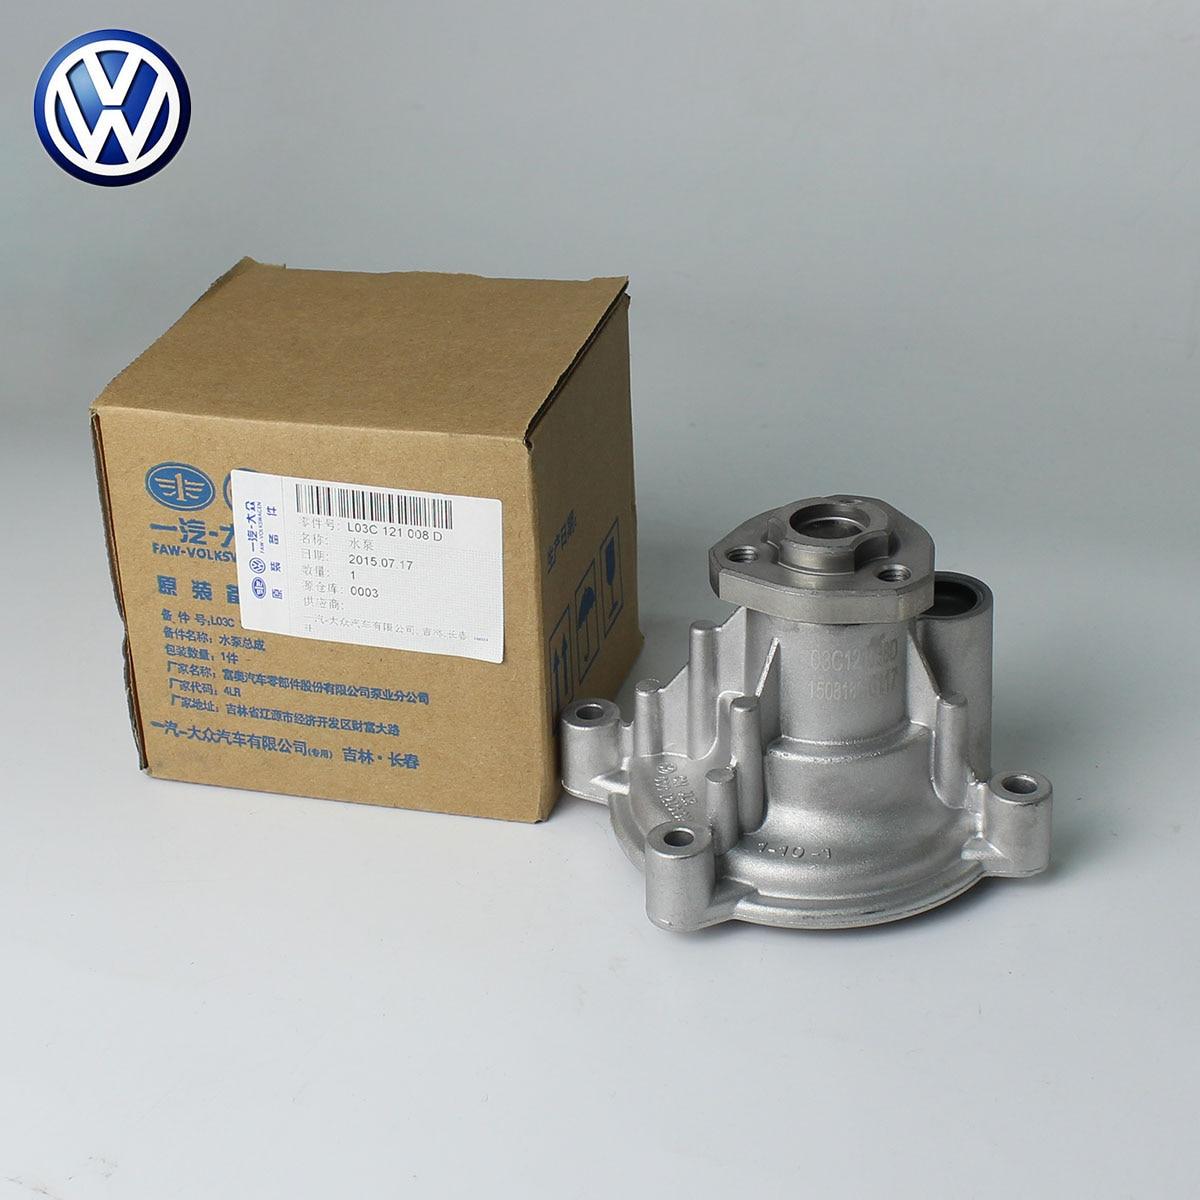 Car Engine Auxiliary Cooling Circulating Water Pump L03C 121 008 D For VW Golf MK6 Passat B6/B7 Jetta MK5/MK6 6162 63 1015 sa6d170e 6d170 engine water pump for komatsu